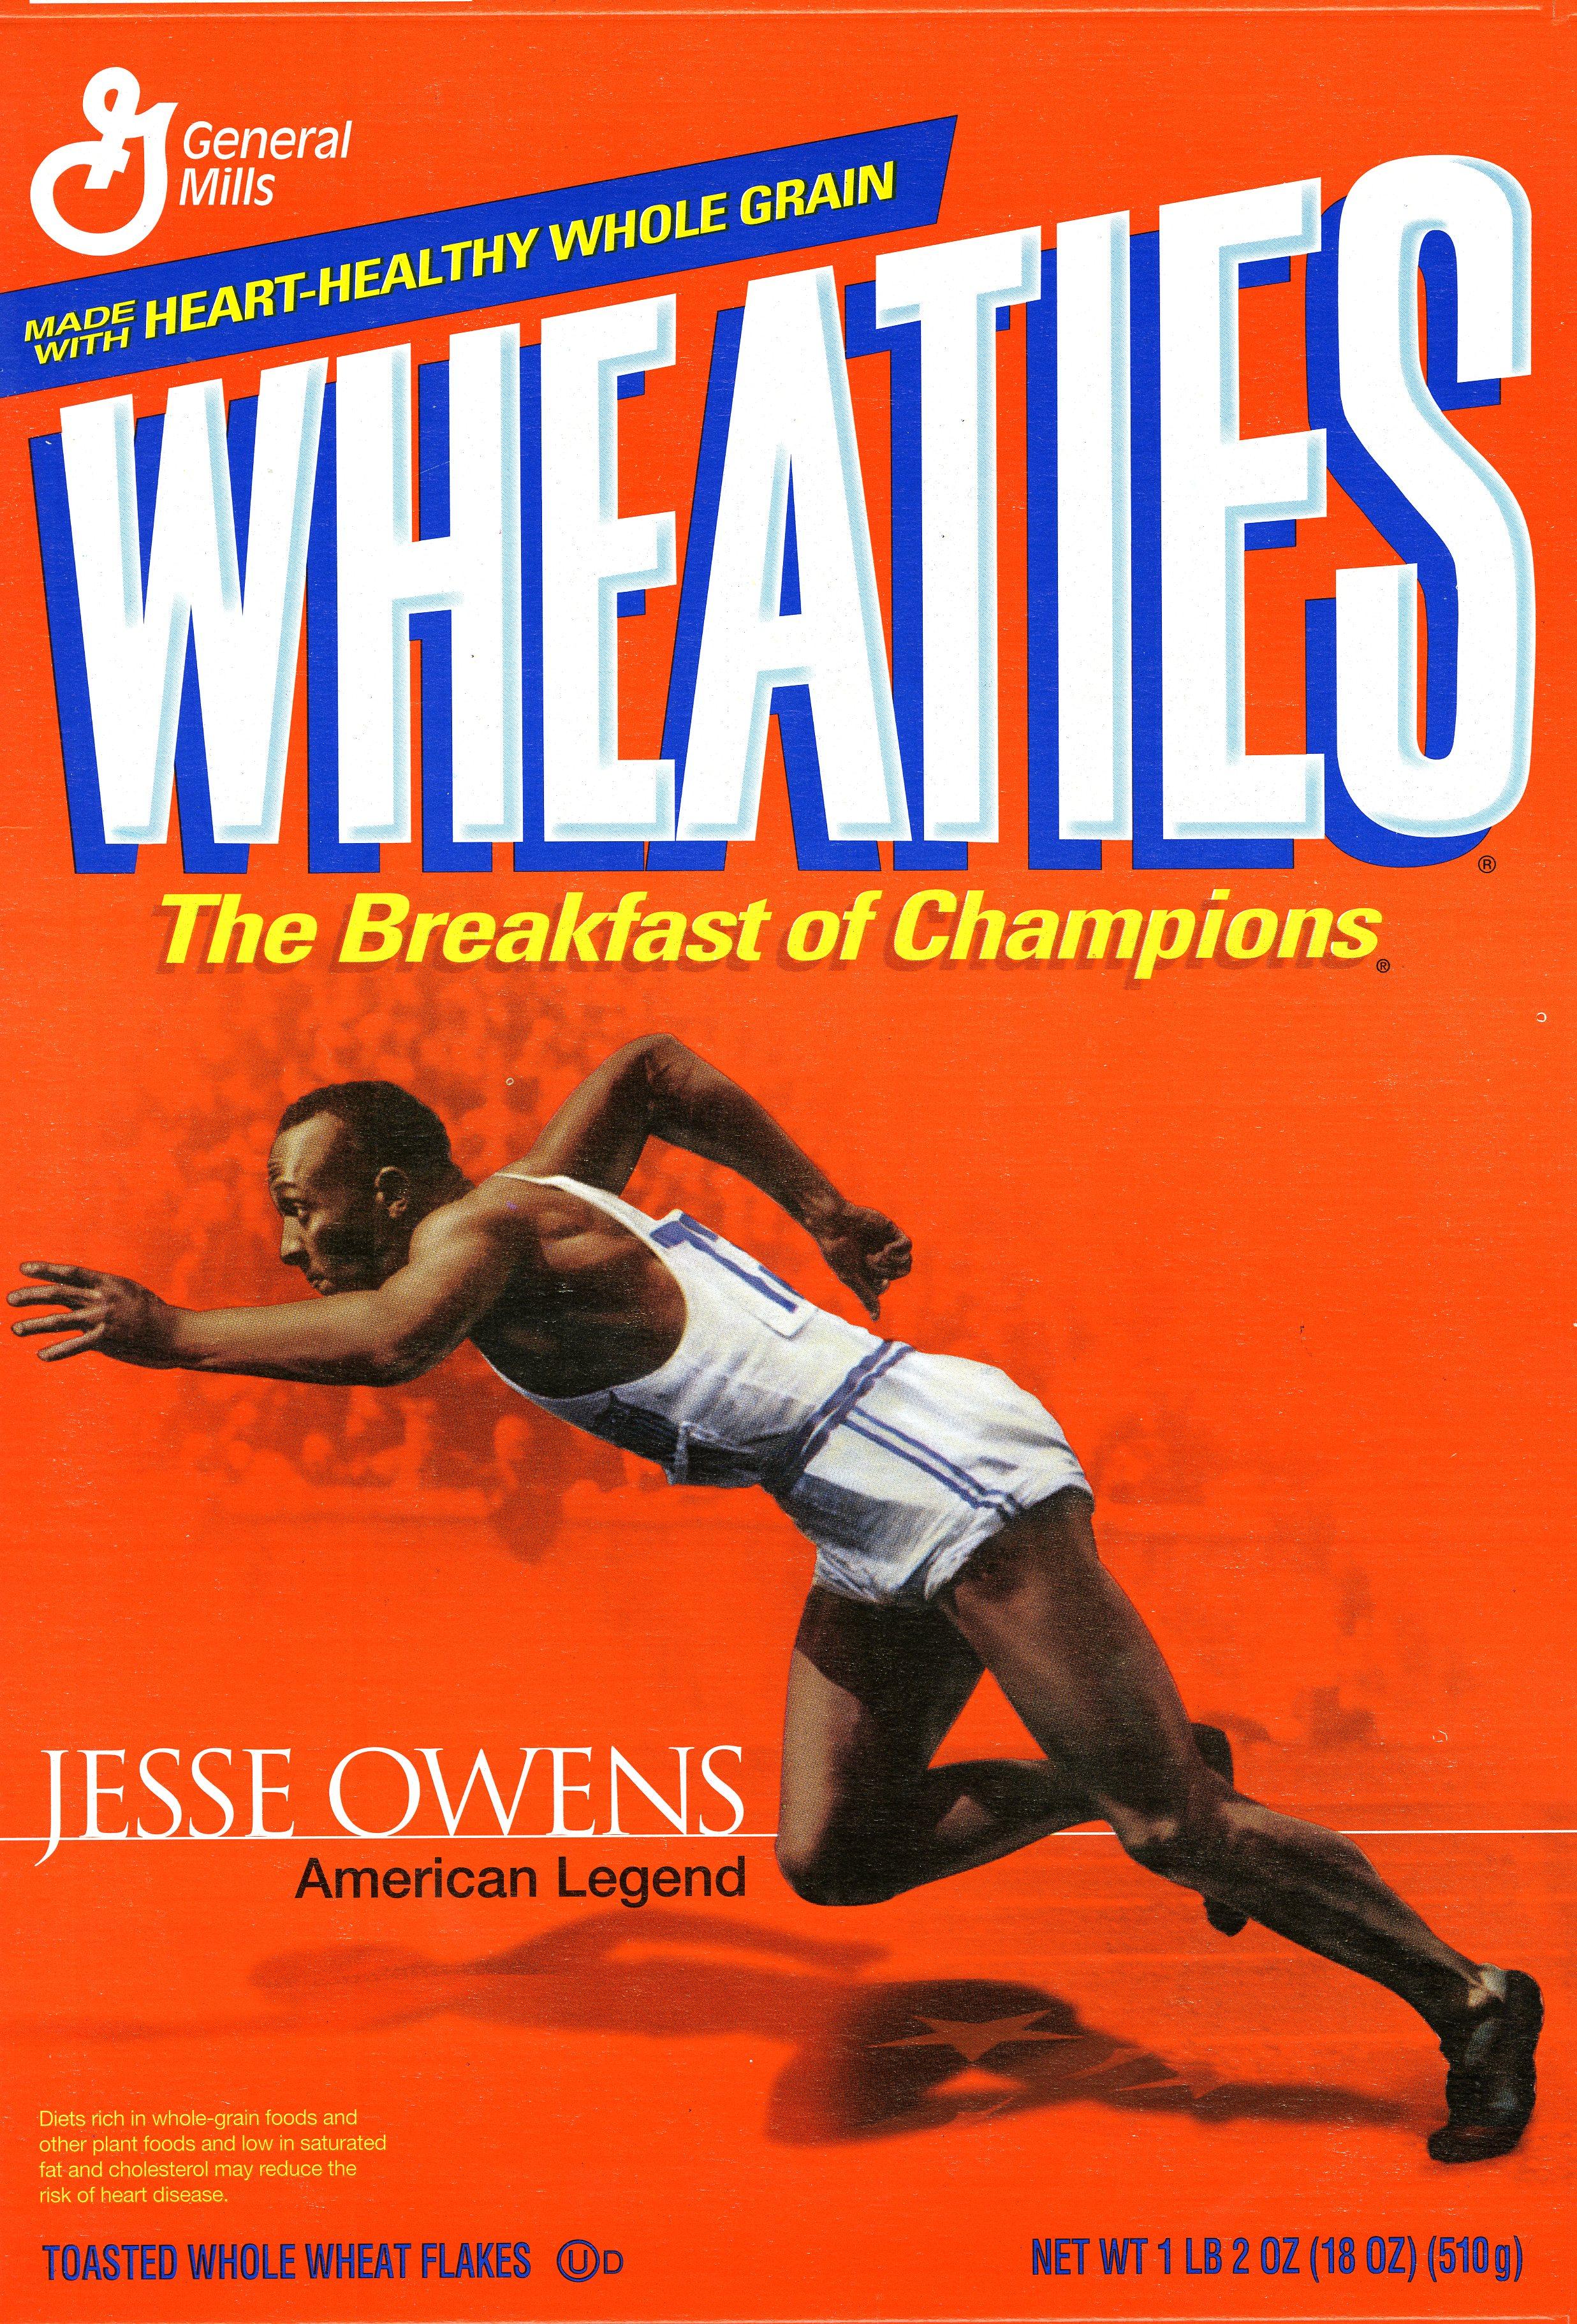 Jesse Owens on the Wheaties box.